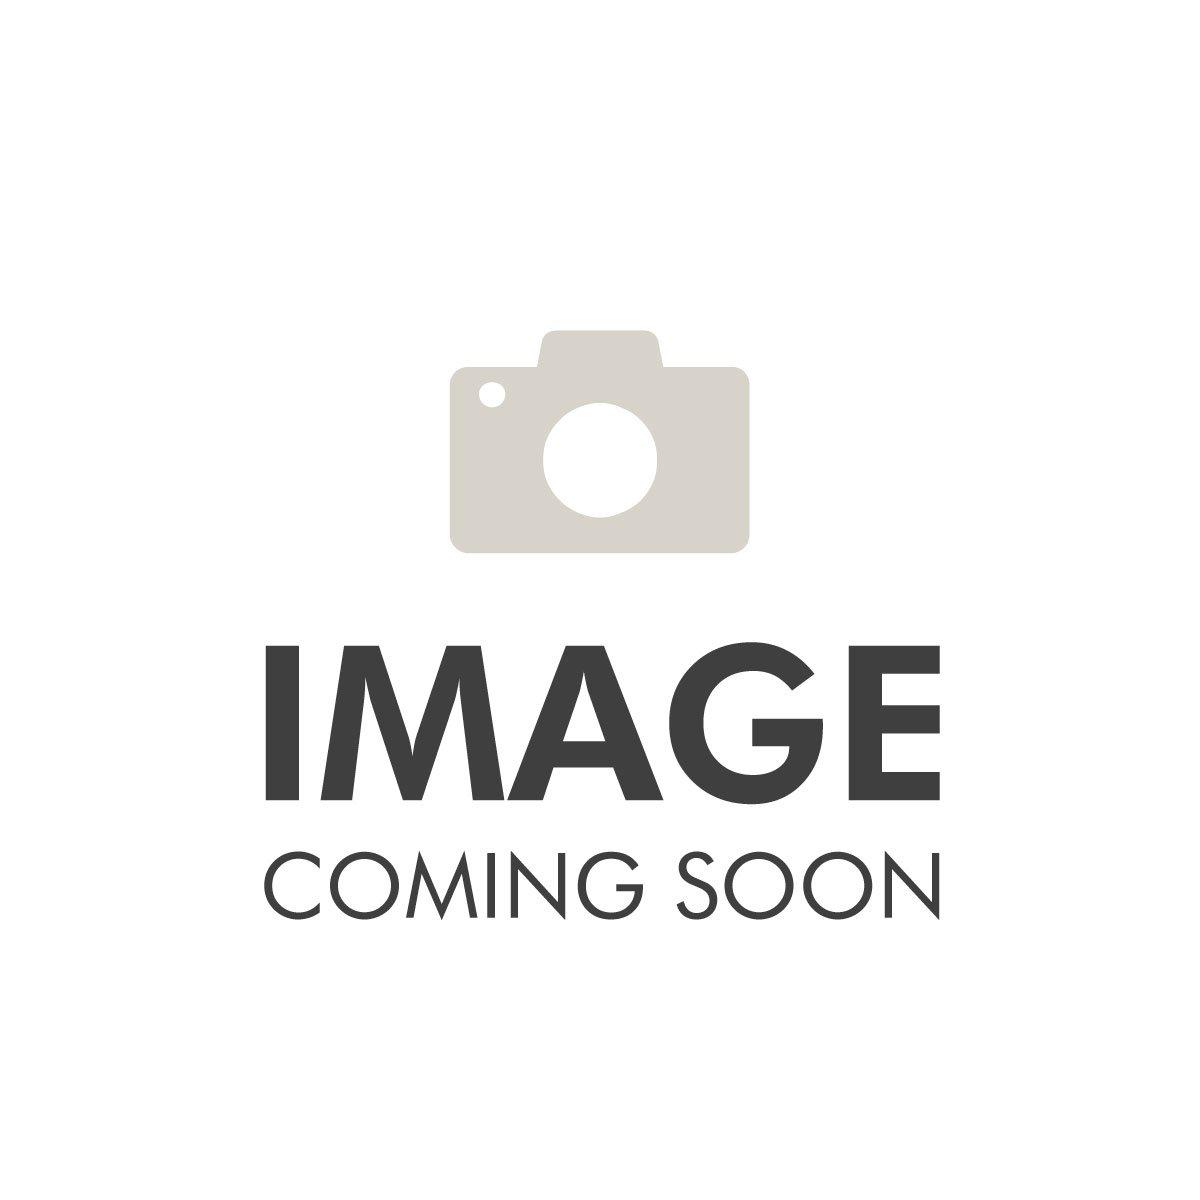 Khloe & Lamar Unbreakable Bond Shower Gel 100ml Not For Individual Sale